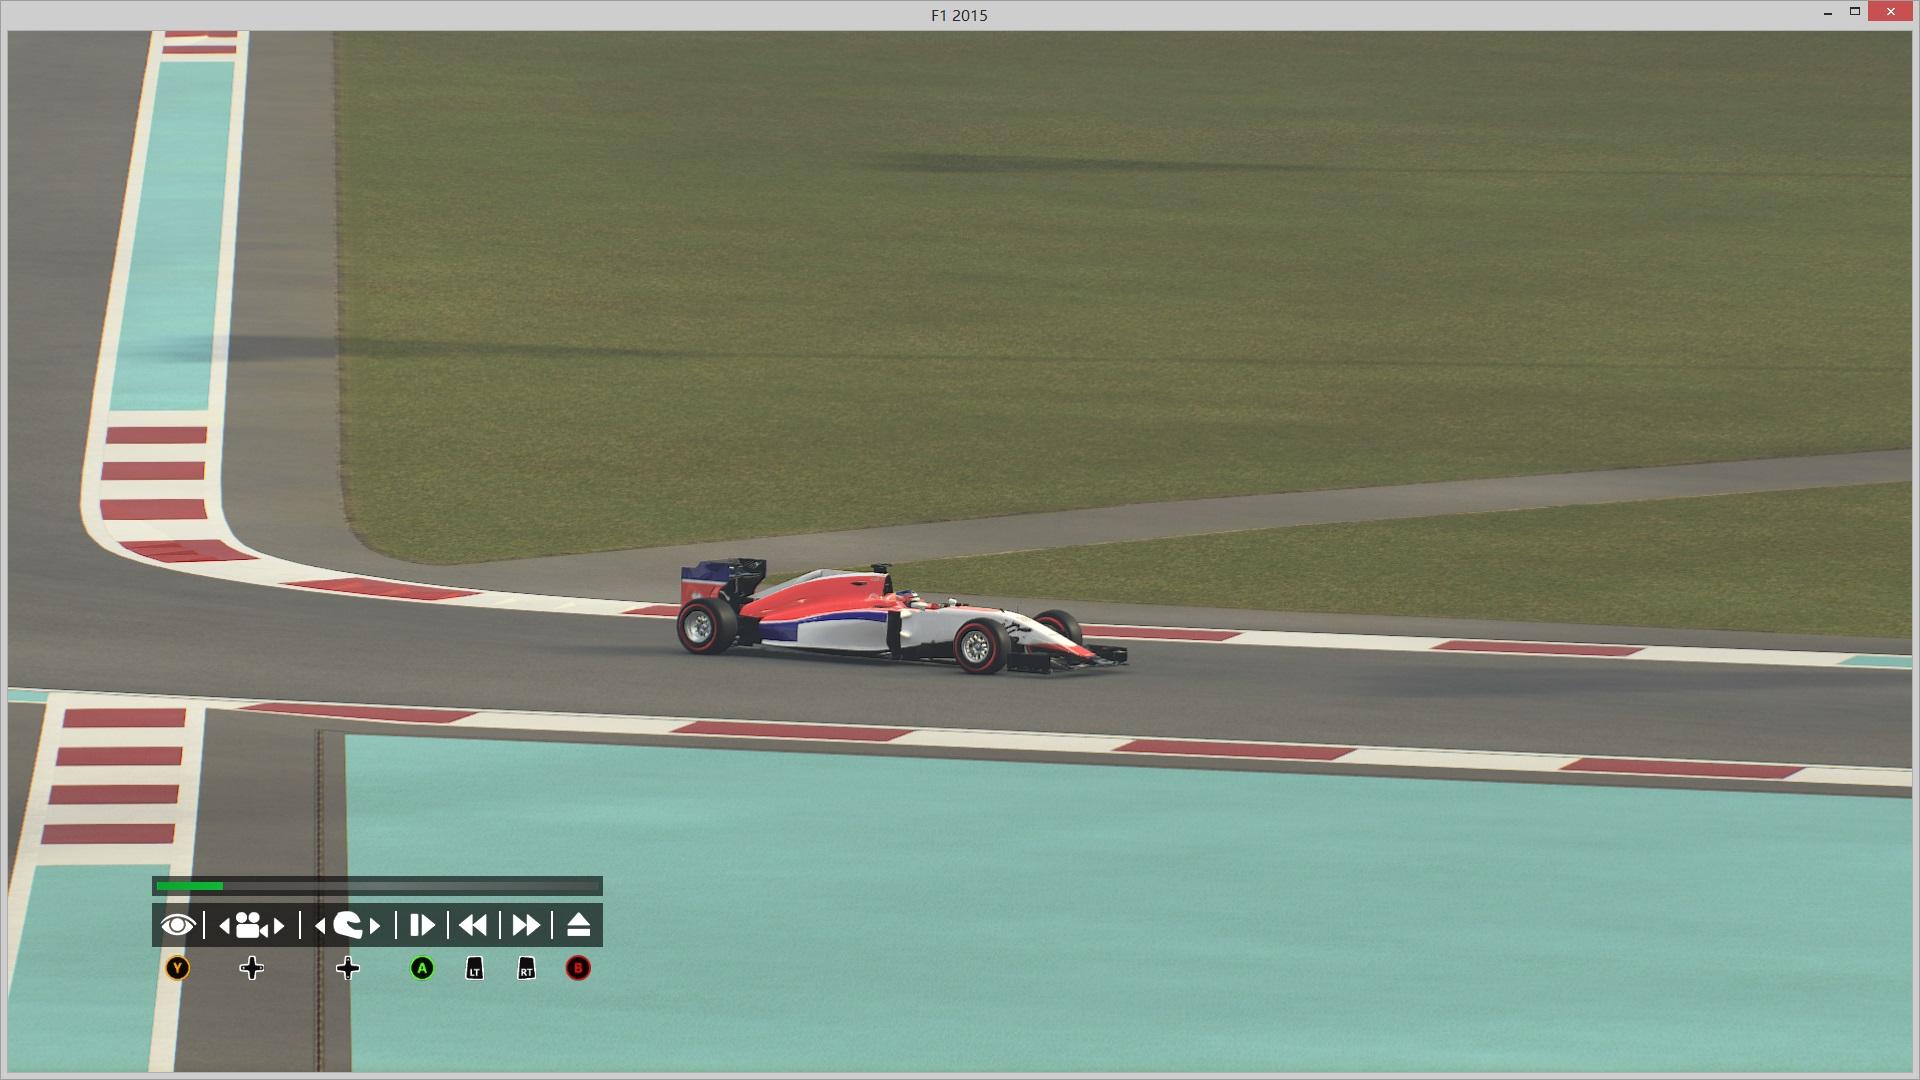 F1 2015 manor.jpg